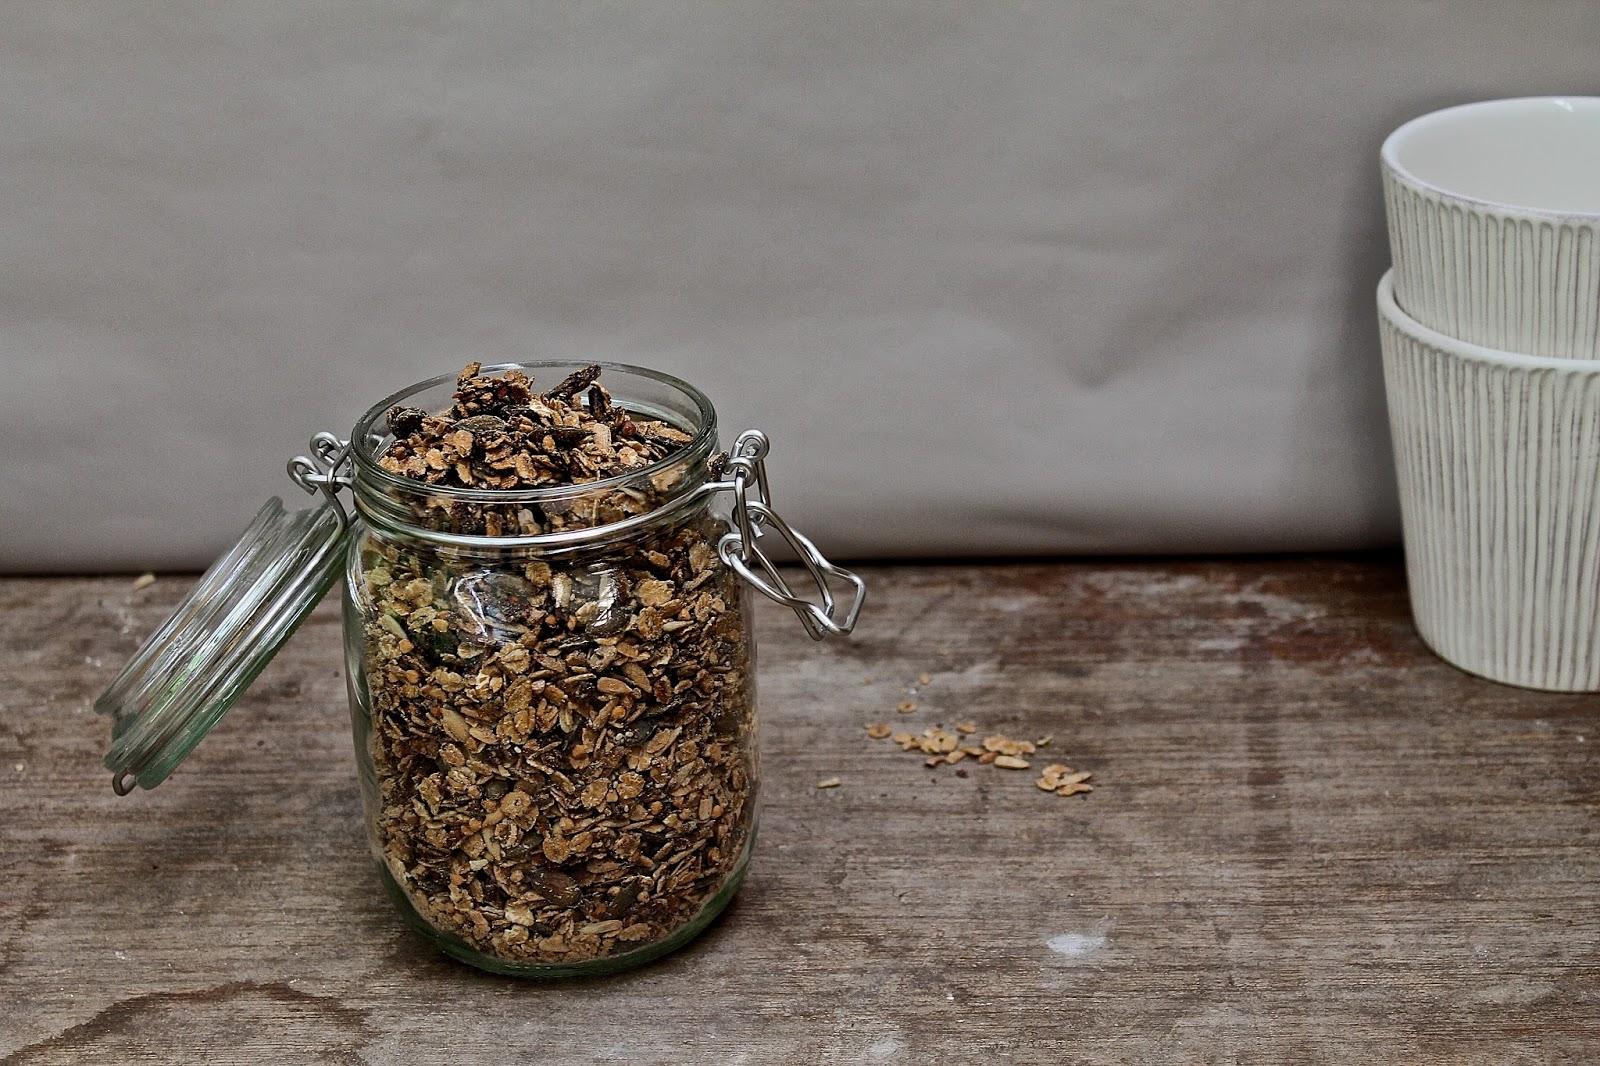 knusper knusper kn uschen homemade granola perfection. Black Bedroom Furniture Sets. Home Design Ideas